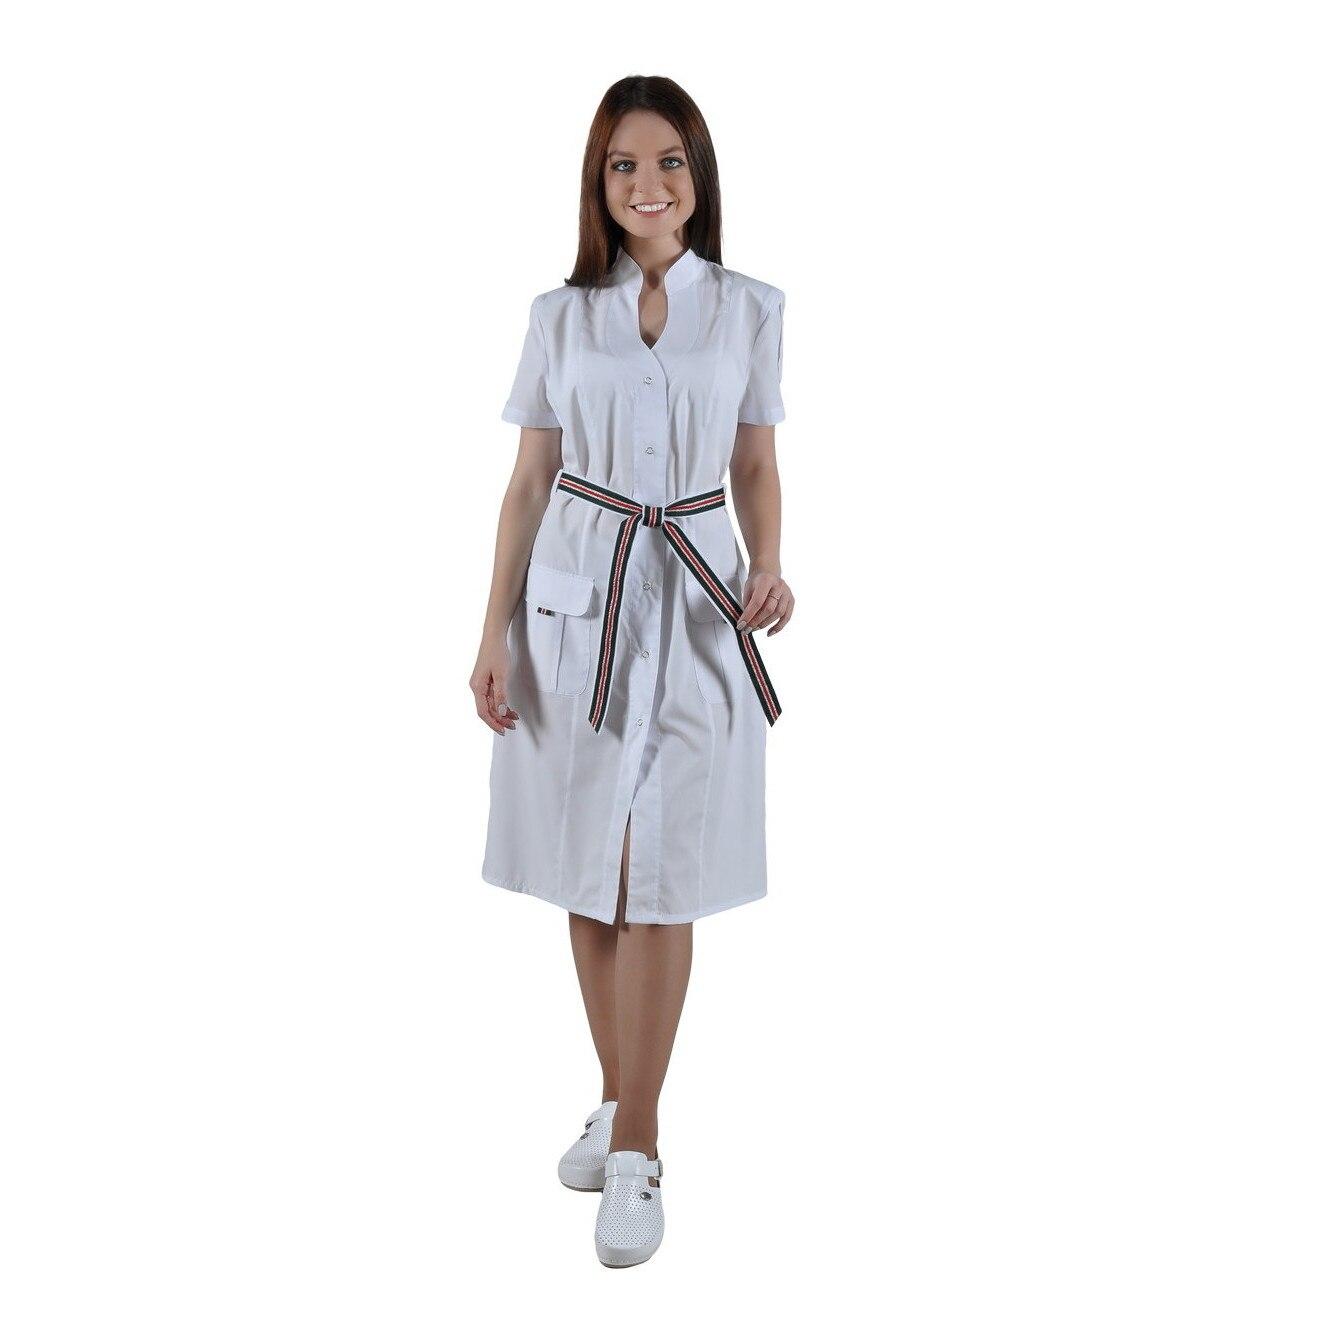 Female medical robe IVUNIFORMA Монарда White